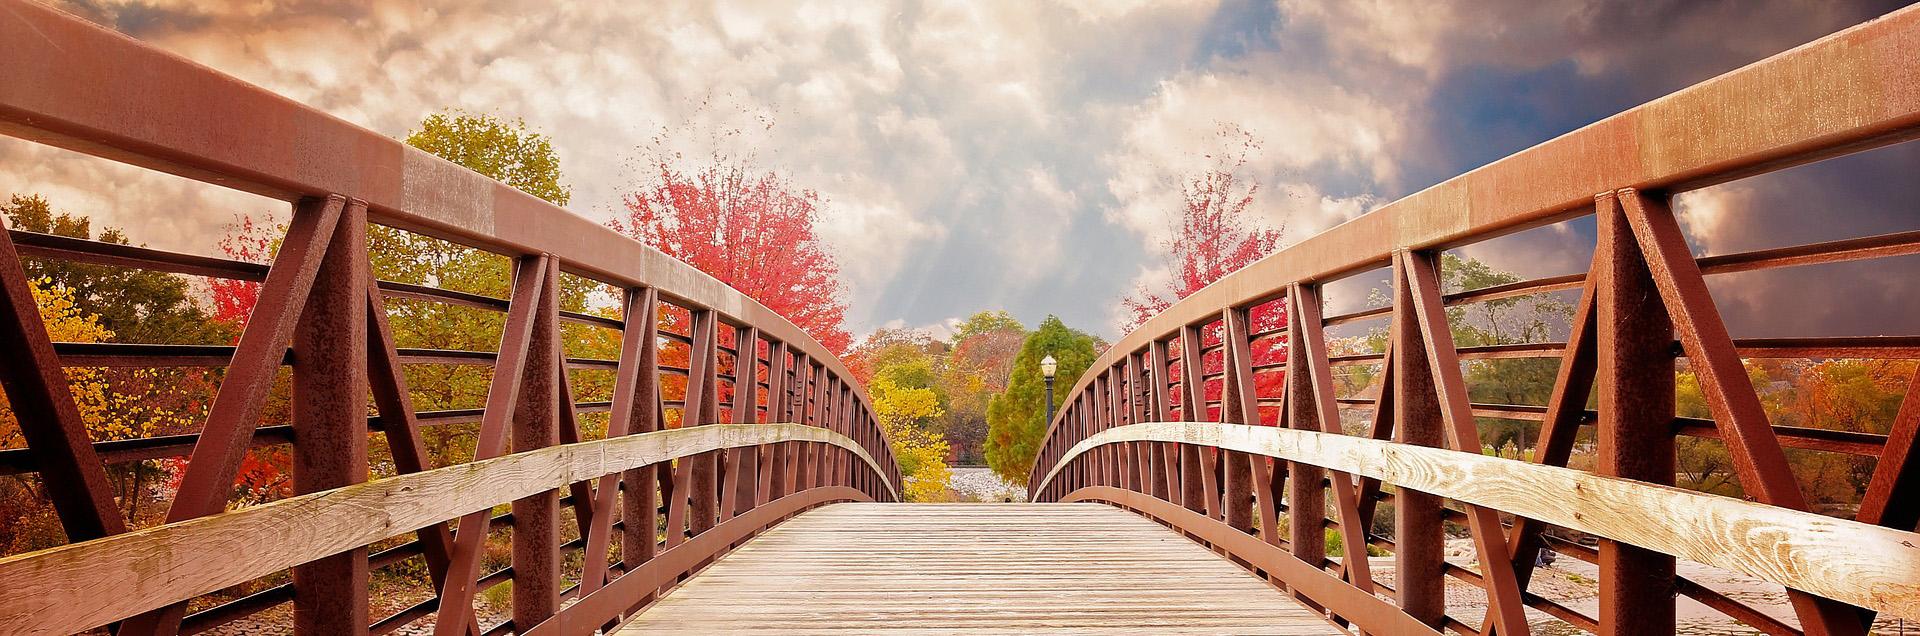 Bridge Skills to Daily Life